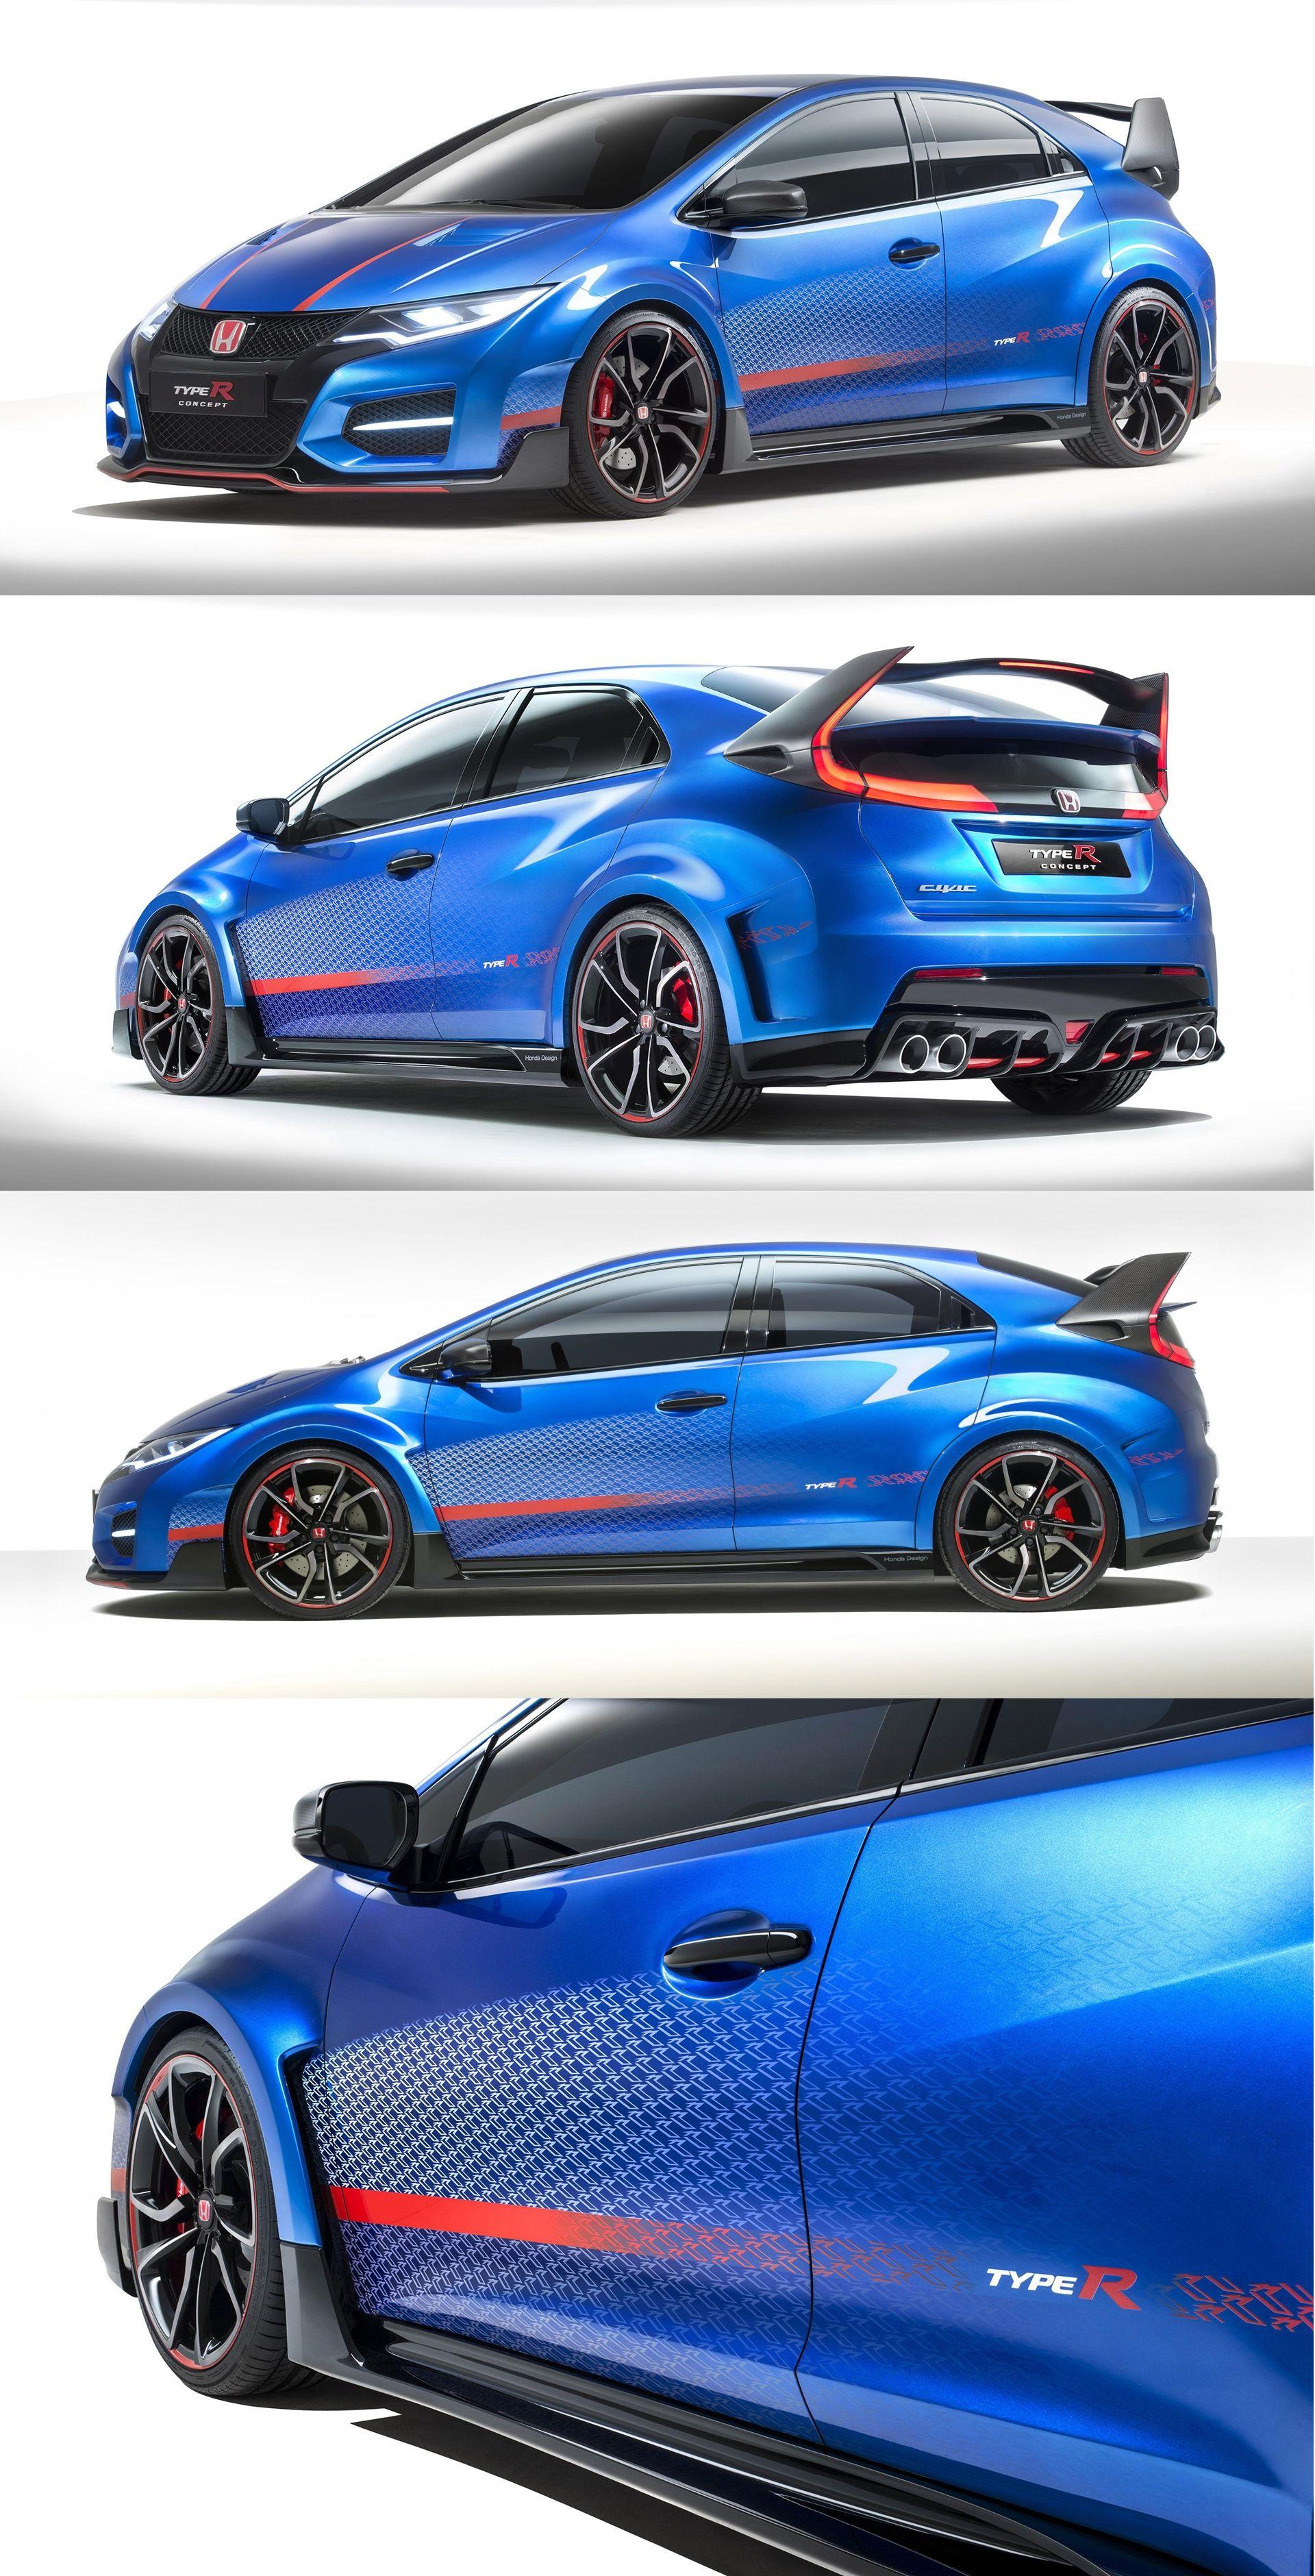 Honda Civic Type R Love It In The Blue But Would Live It In The Black More Honda Civic Type R Honda Civic Honda Cars